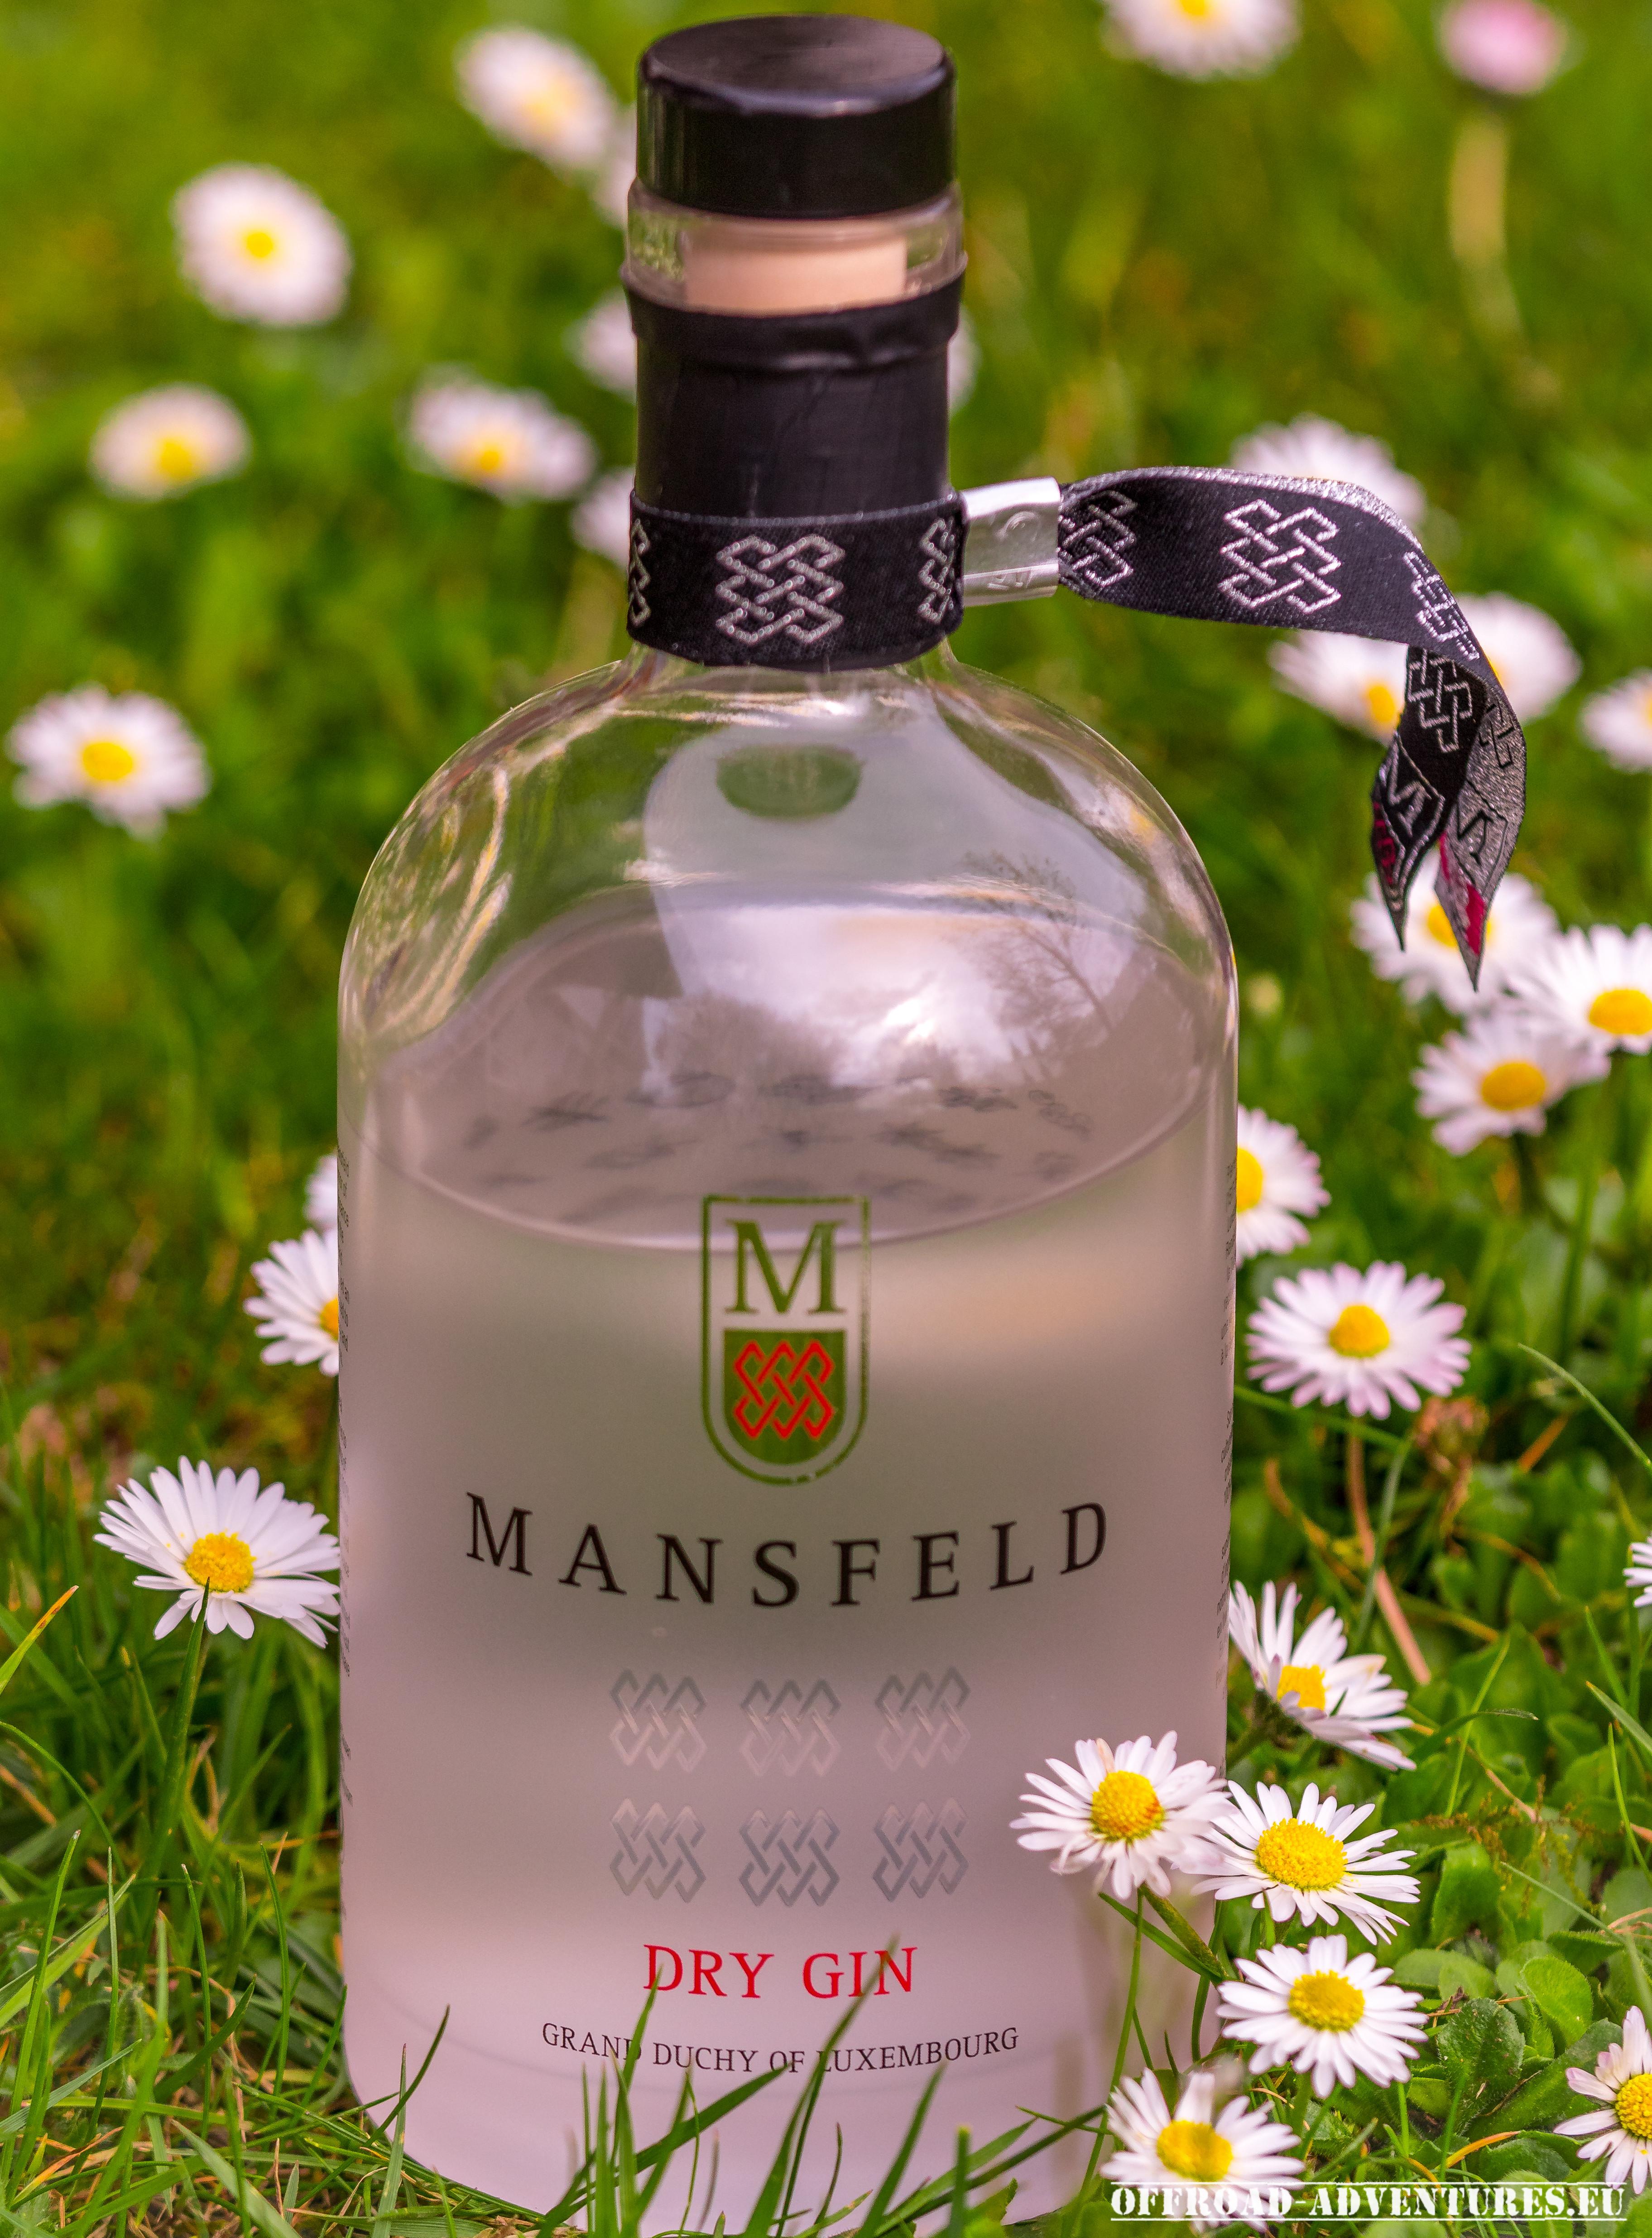 Mansfeld Dry Gin